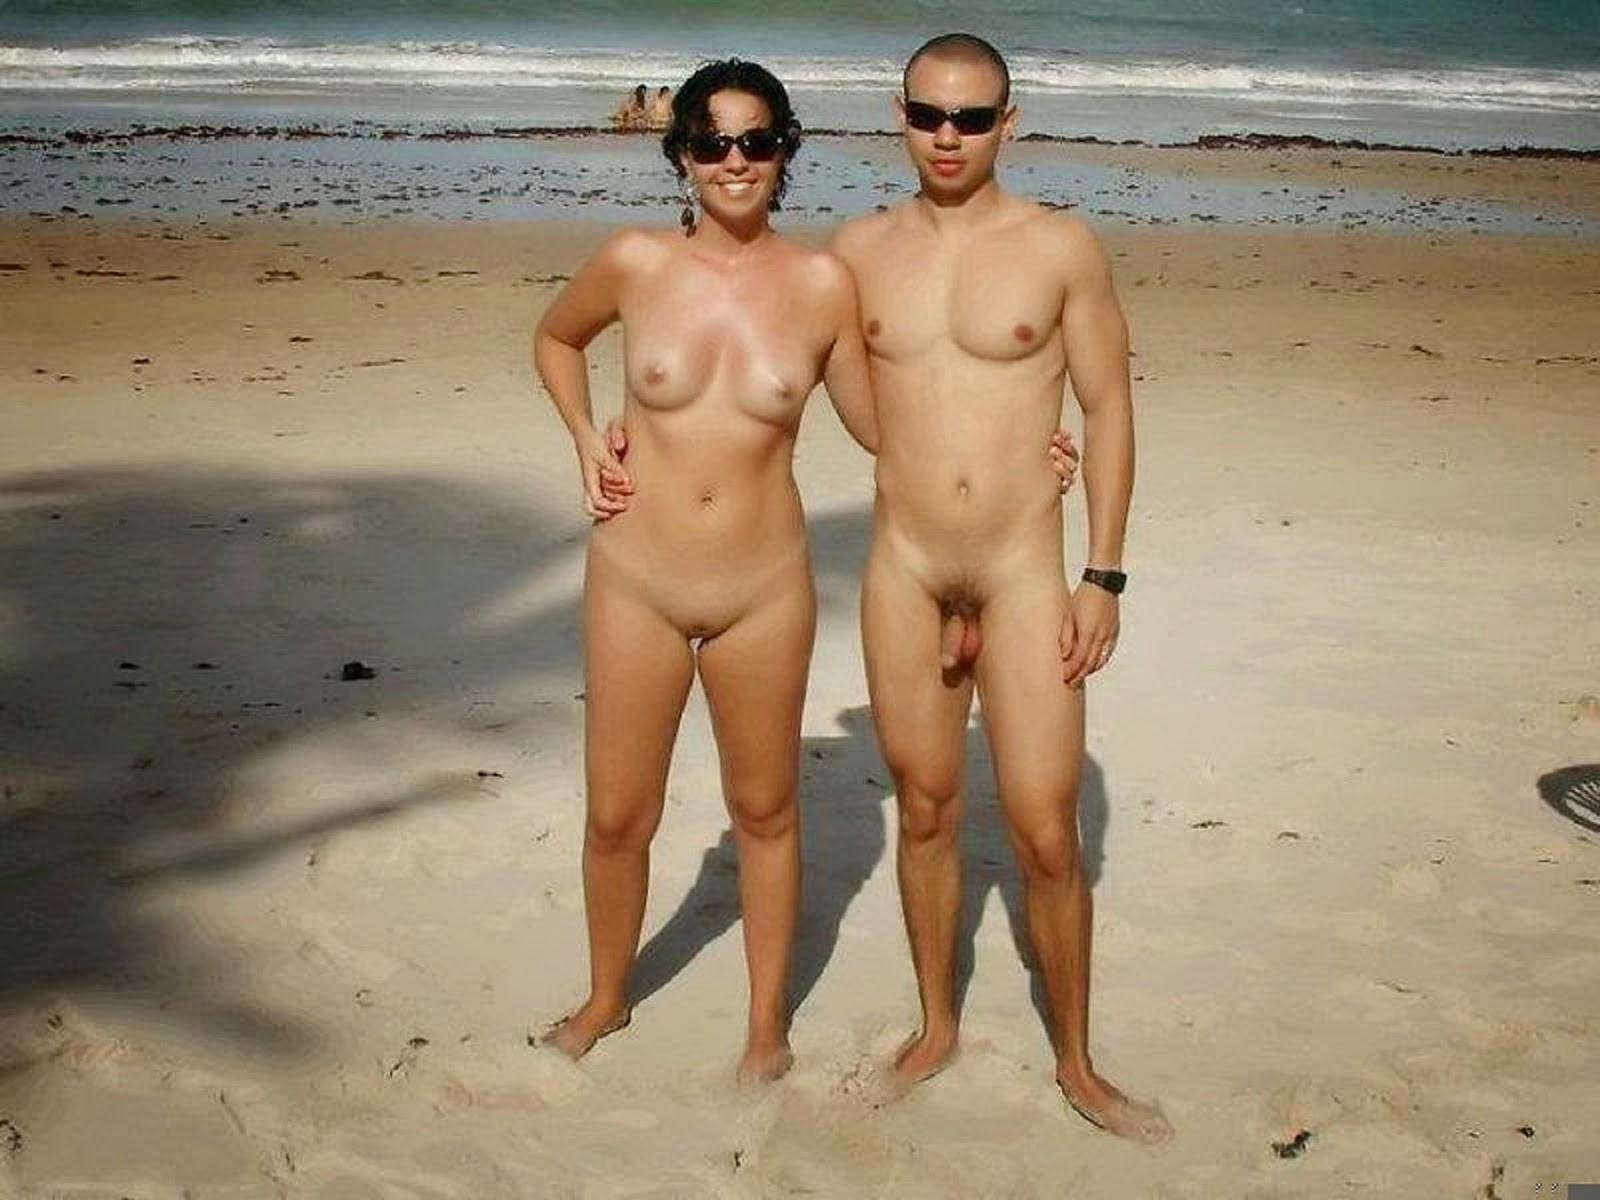 The message Praia de nudismo vidio understood